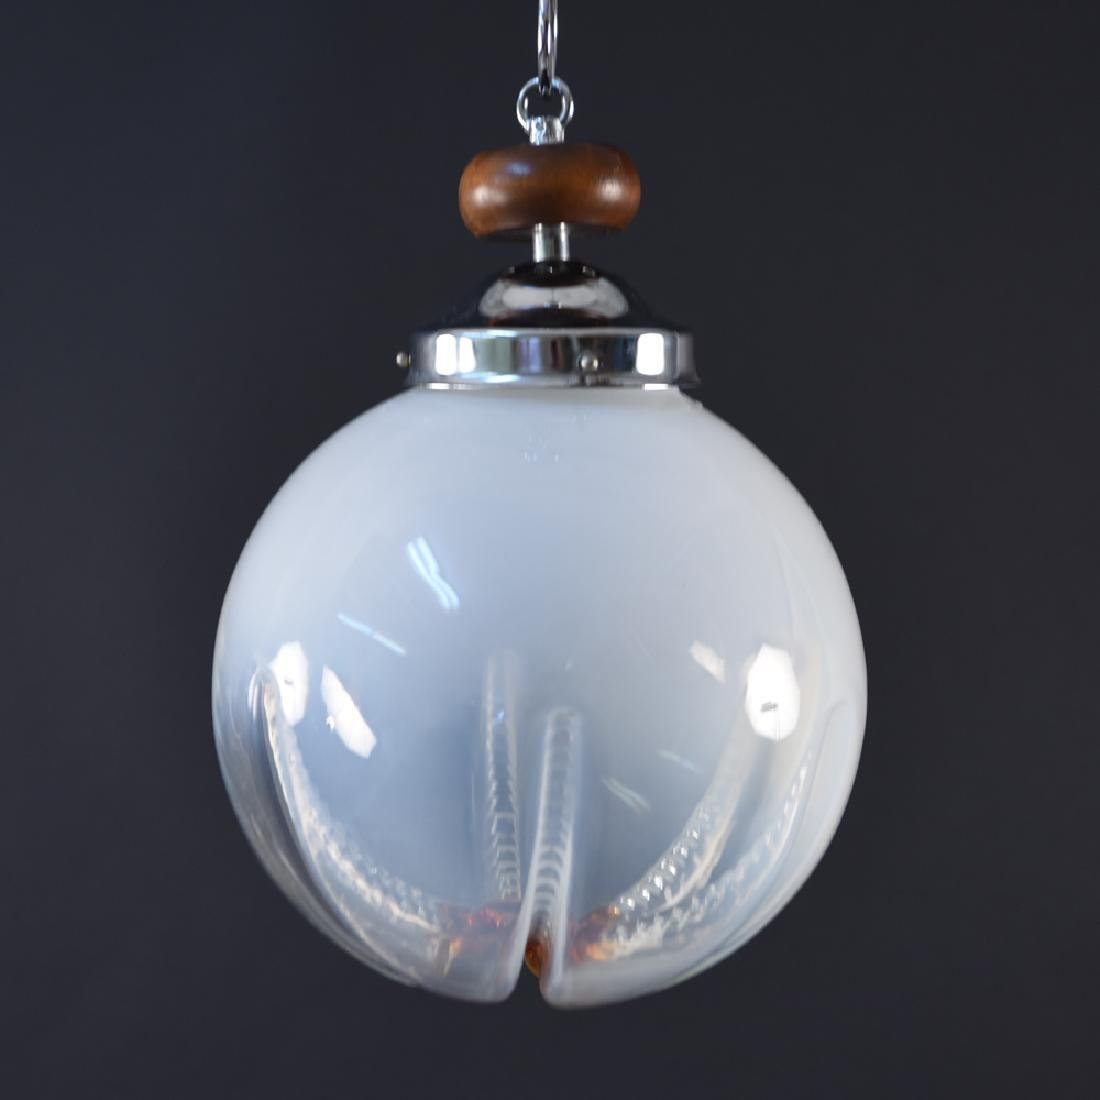 MAZZEGA MURANO ITALIAN GLASS PENDANT LAMP